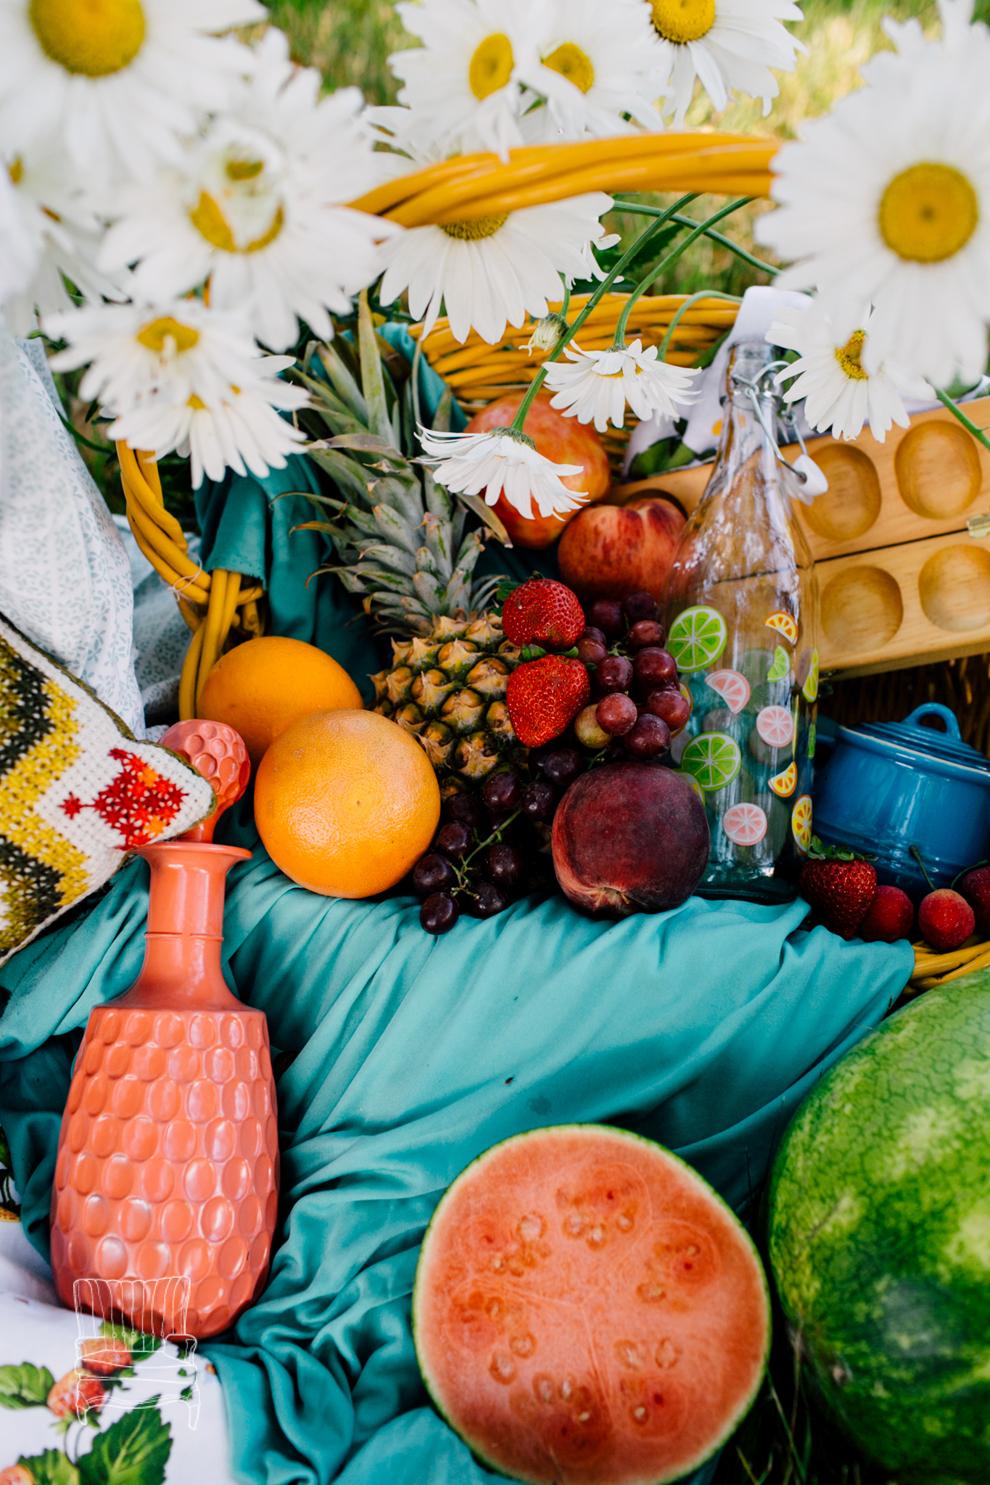 006-bellingham-summer-mini-session-fruity-styled-katheryn-moran-photography.jpg